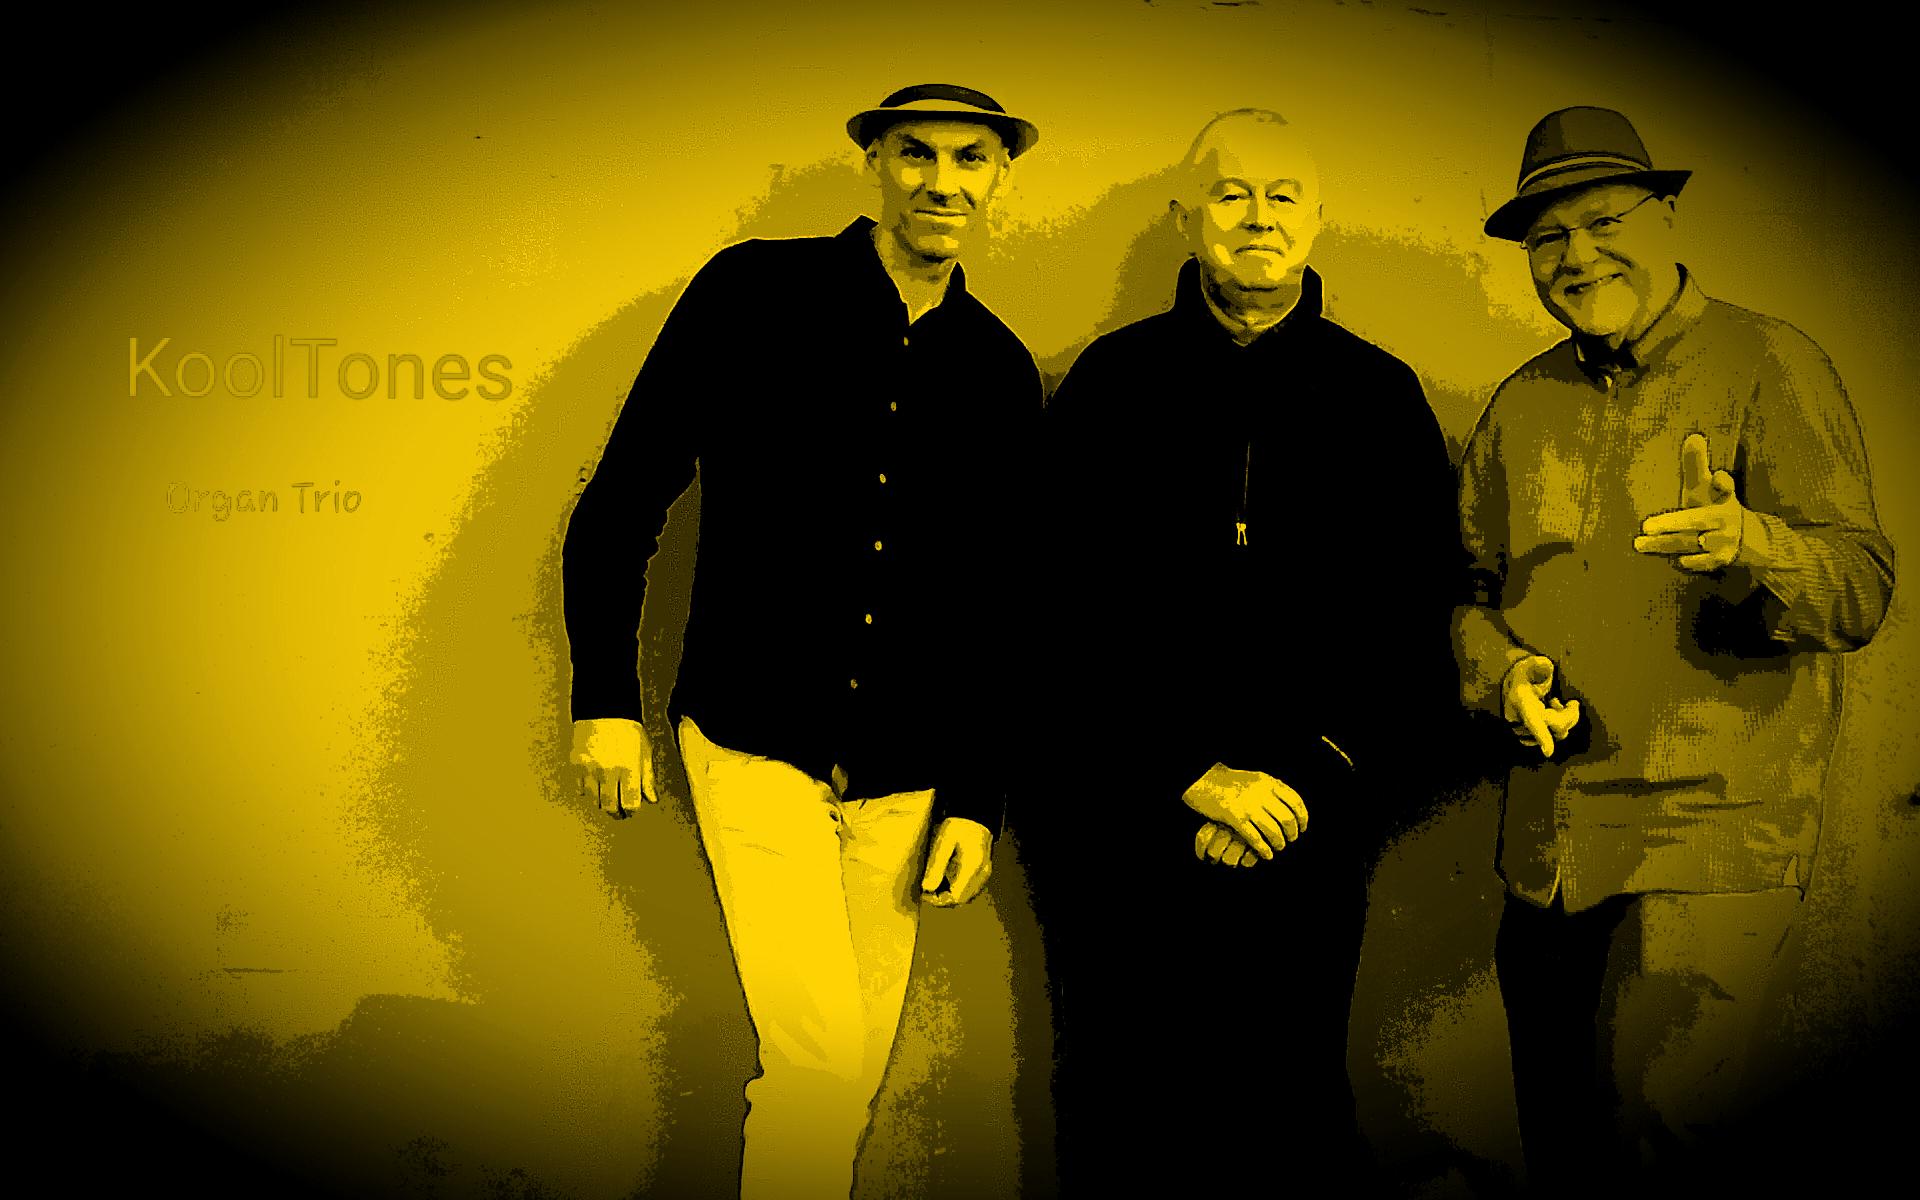 KoolTones Group Photo poster_edited